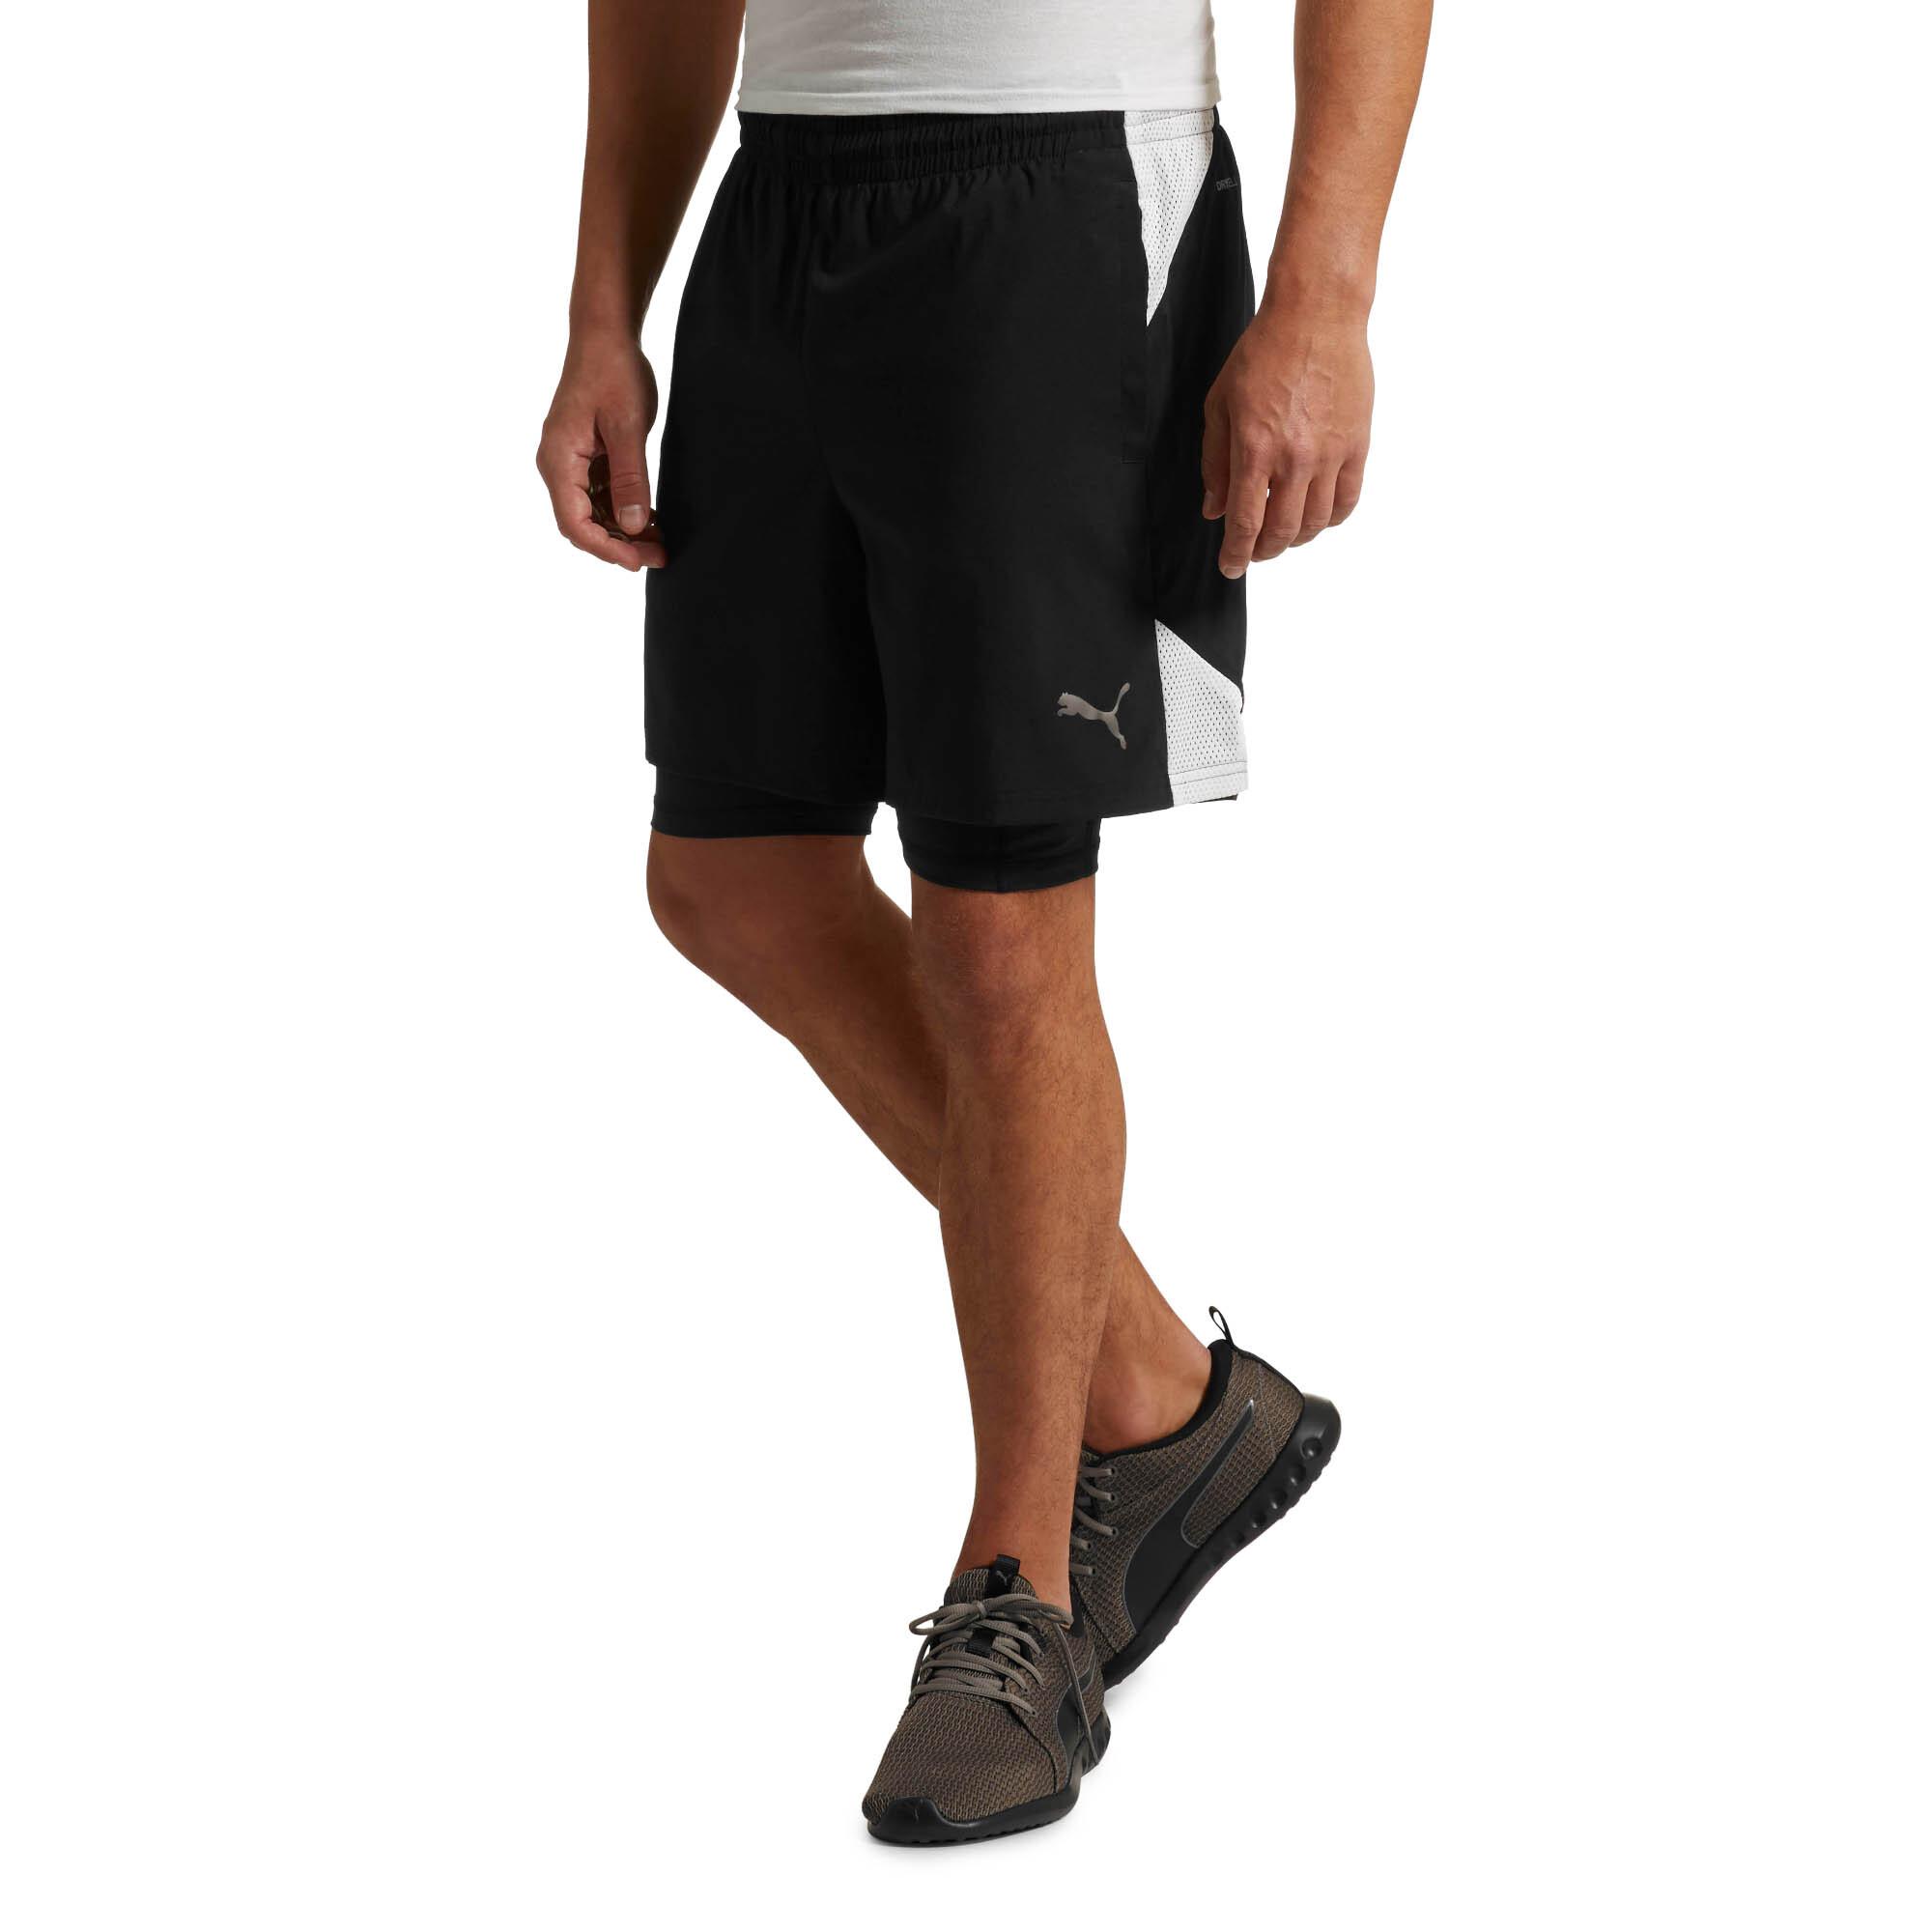 Image Puma A.C.E. Woven 2 in 1 Men's Training Shorts #1